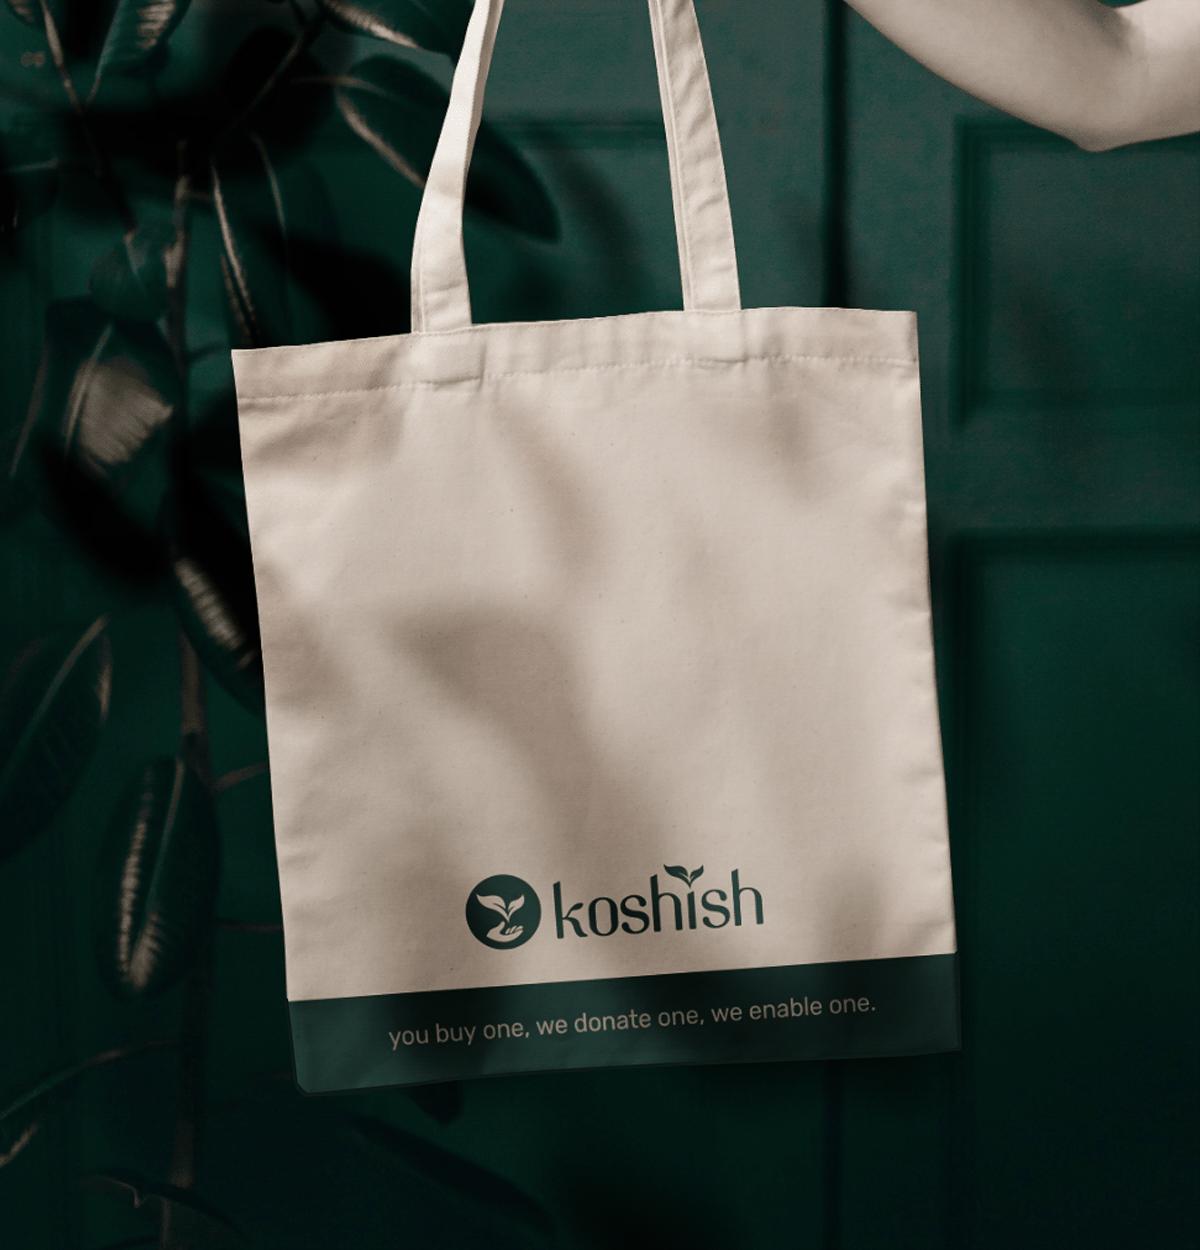 brand branding  Clothing Ecommerce Fashion  Garments koshish natural typography